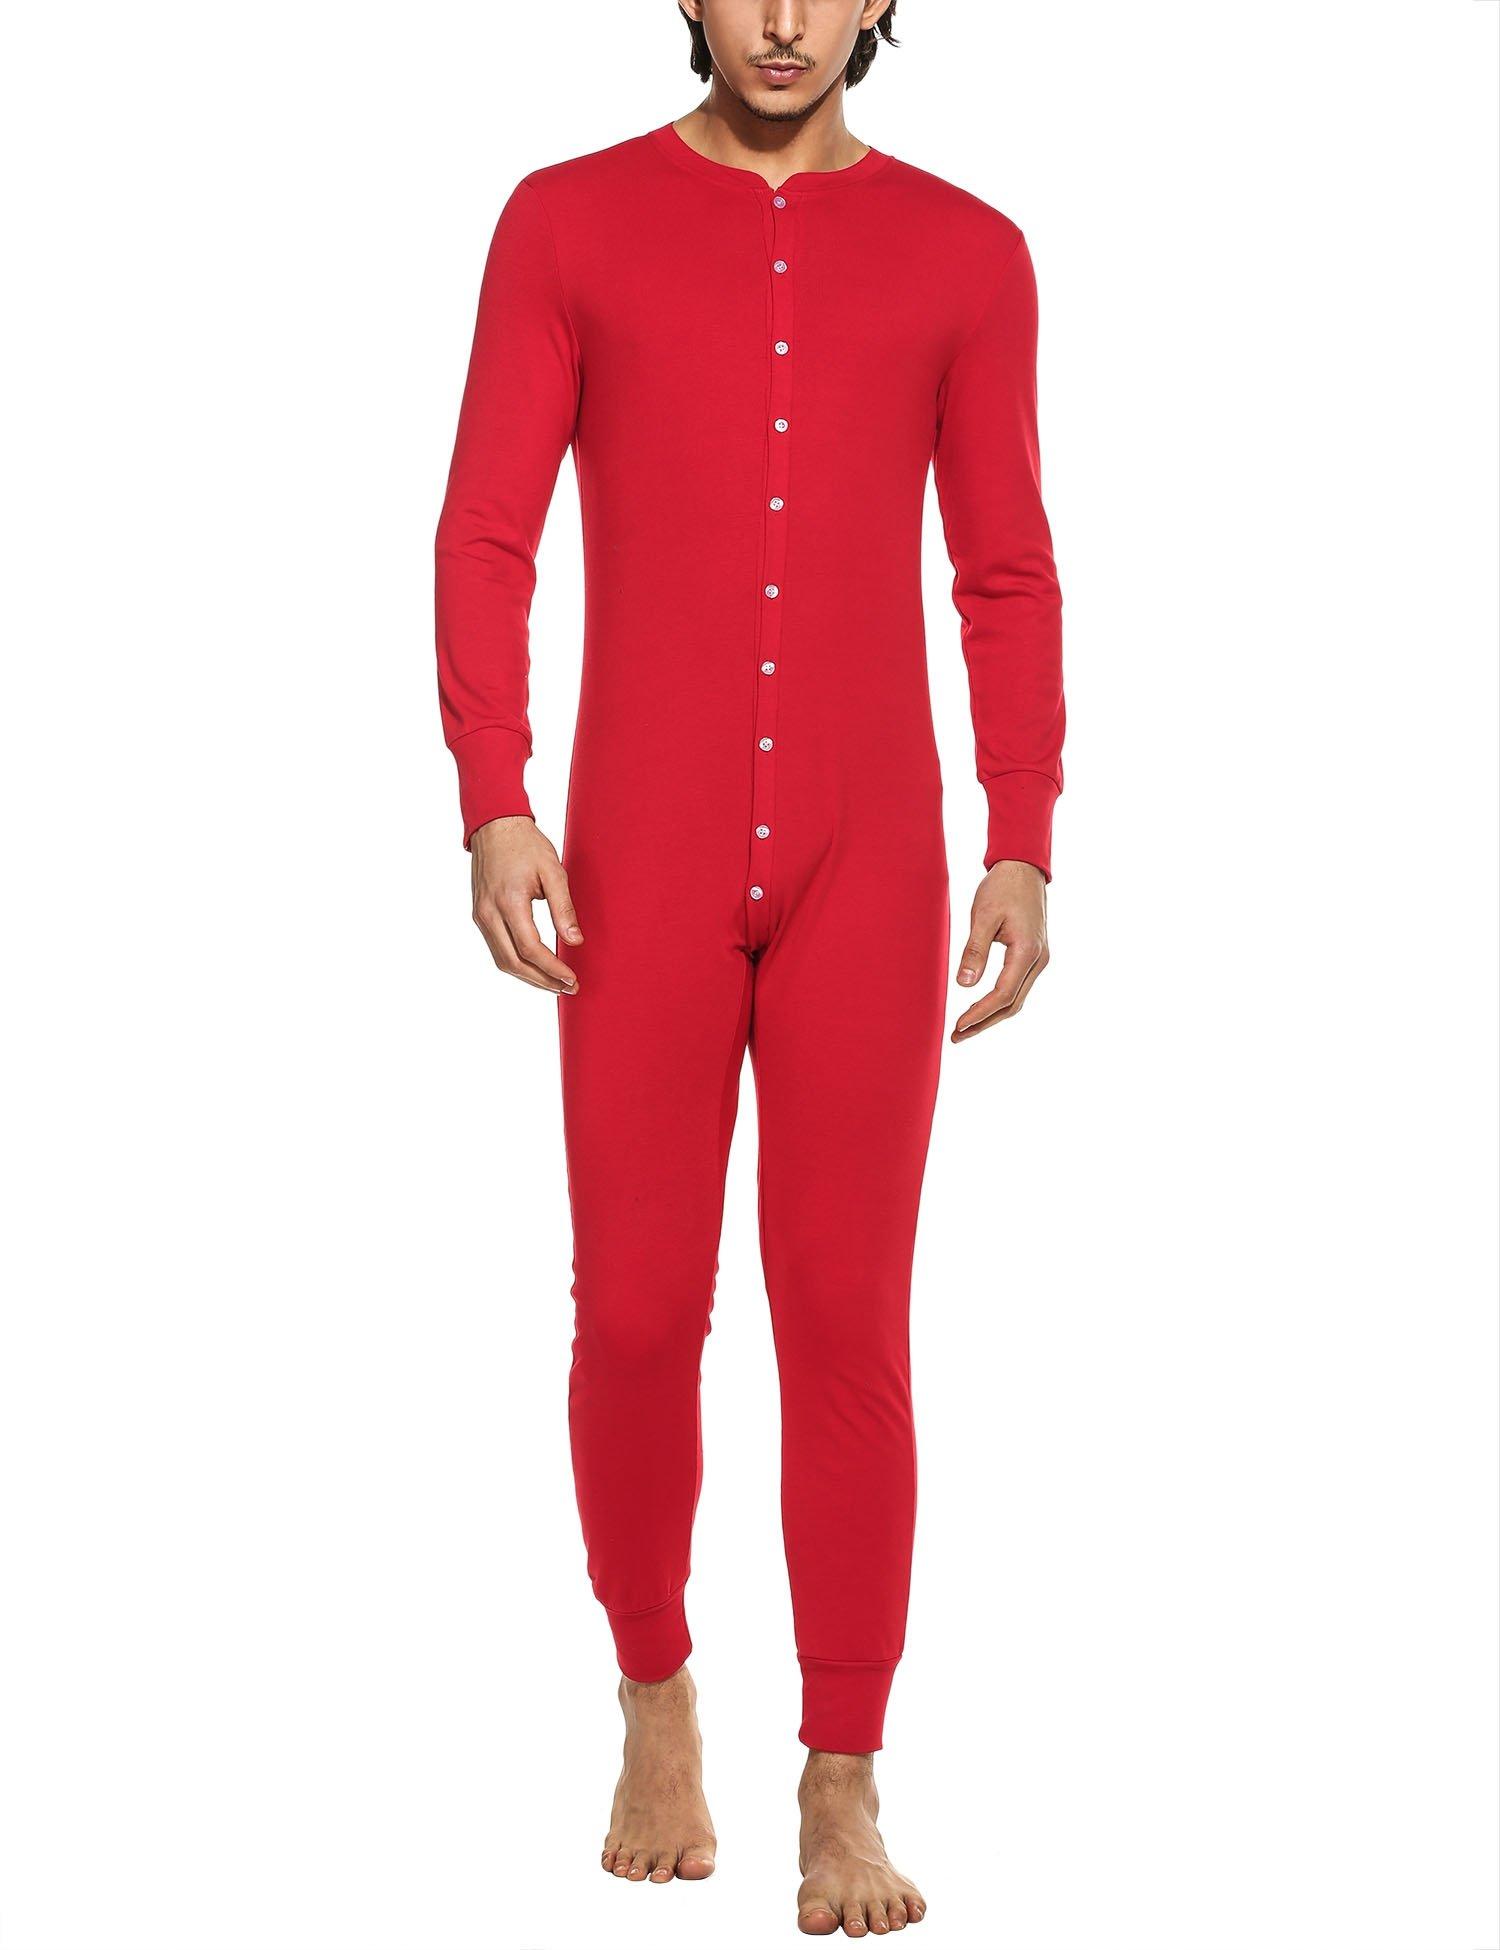 Hotouch Men's Long Midweight Cotton Union Suit Red M